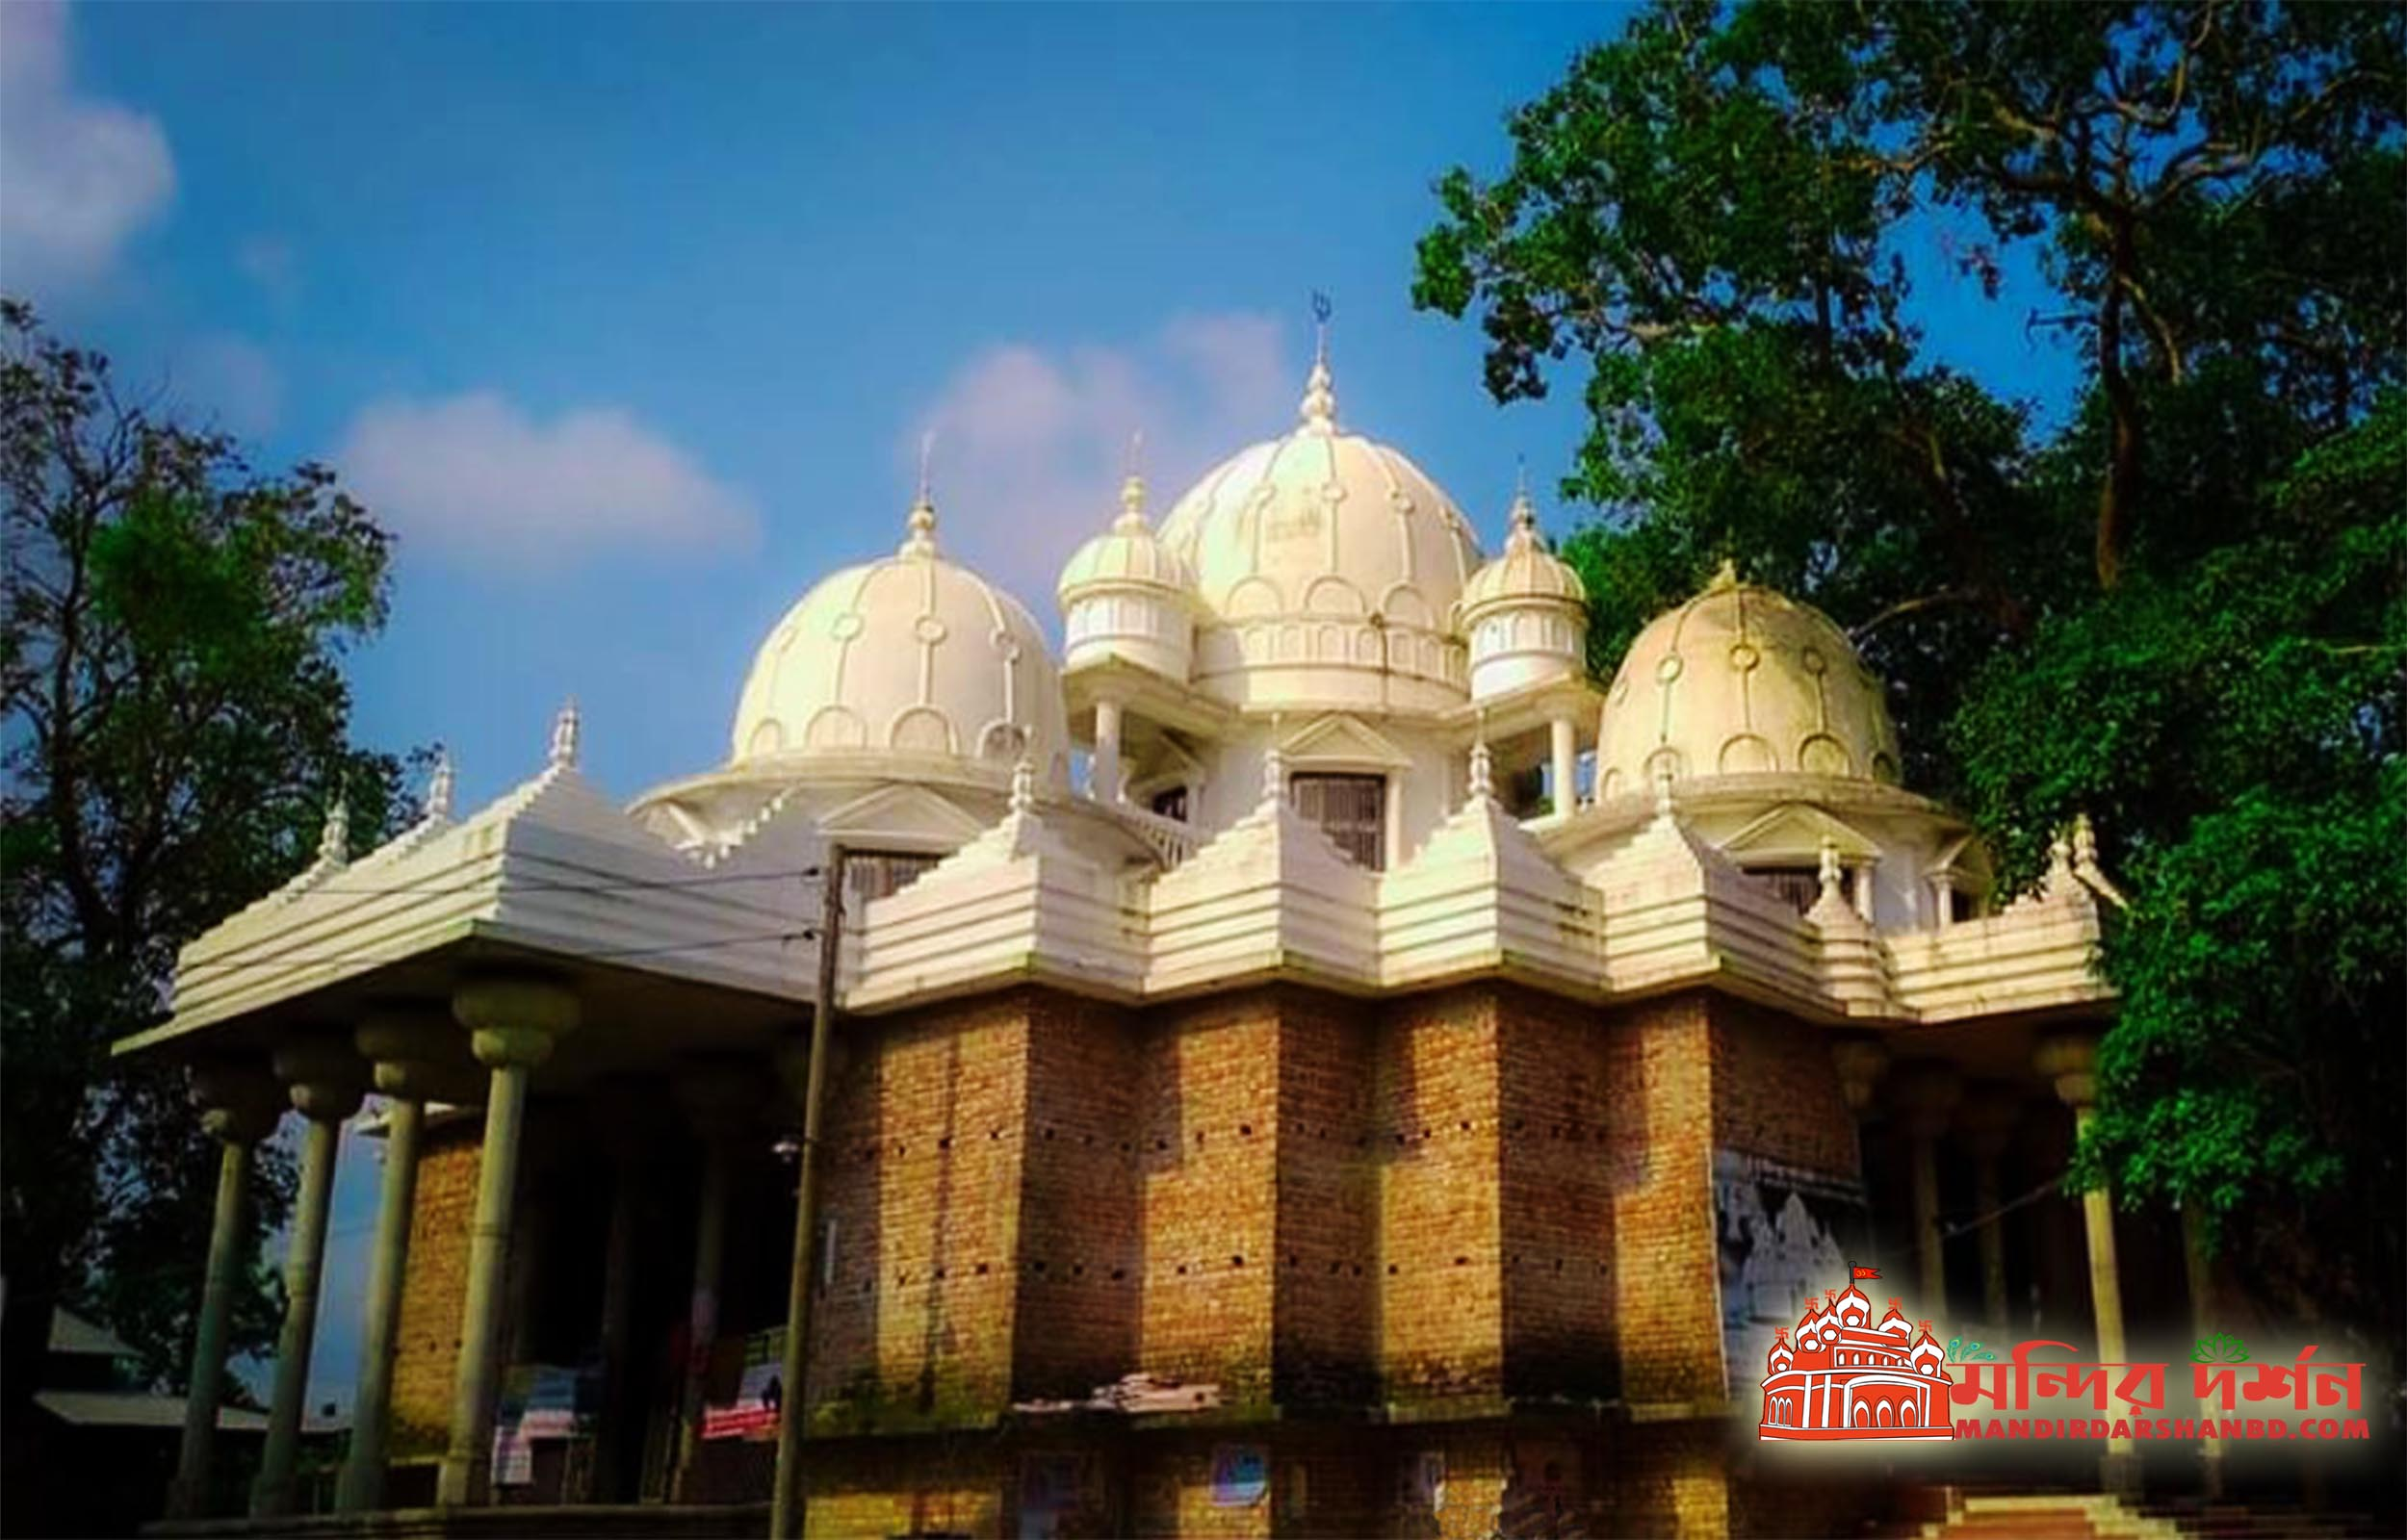 Chinishpur temple